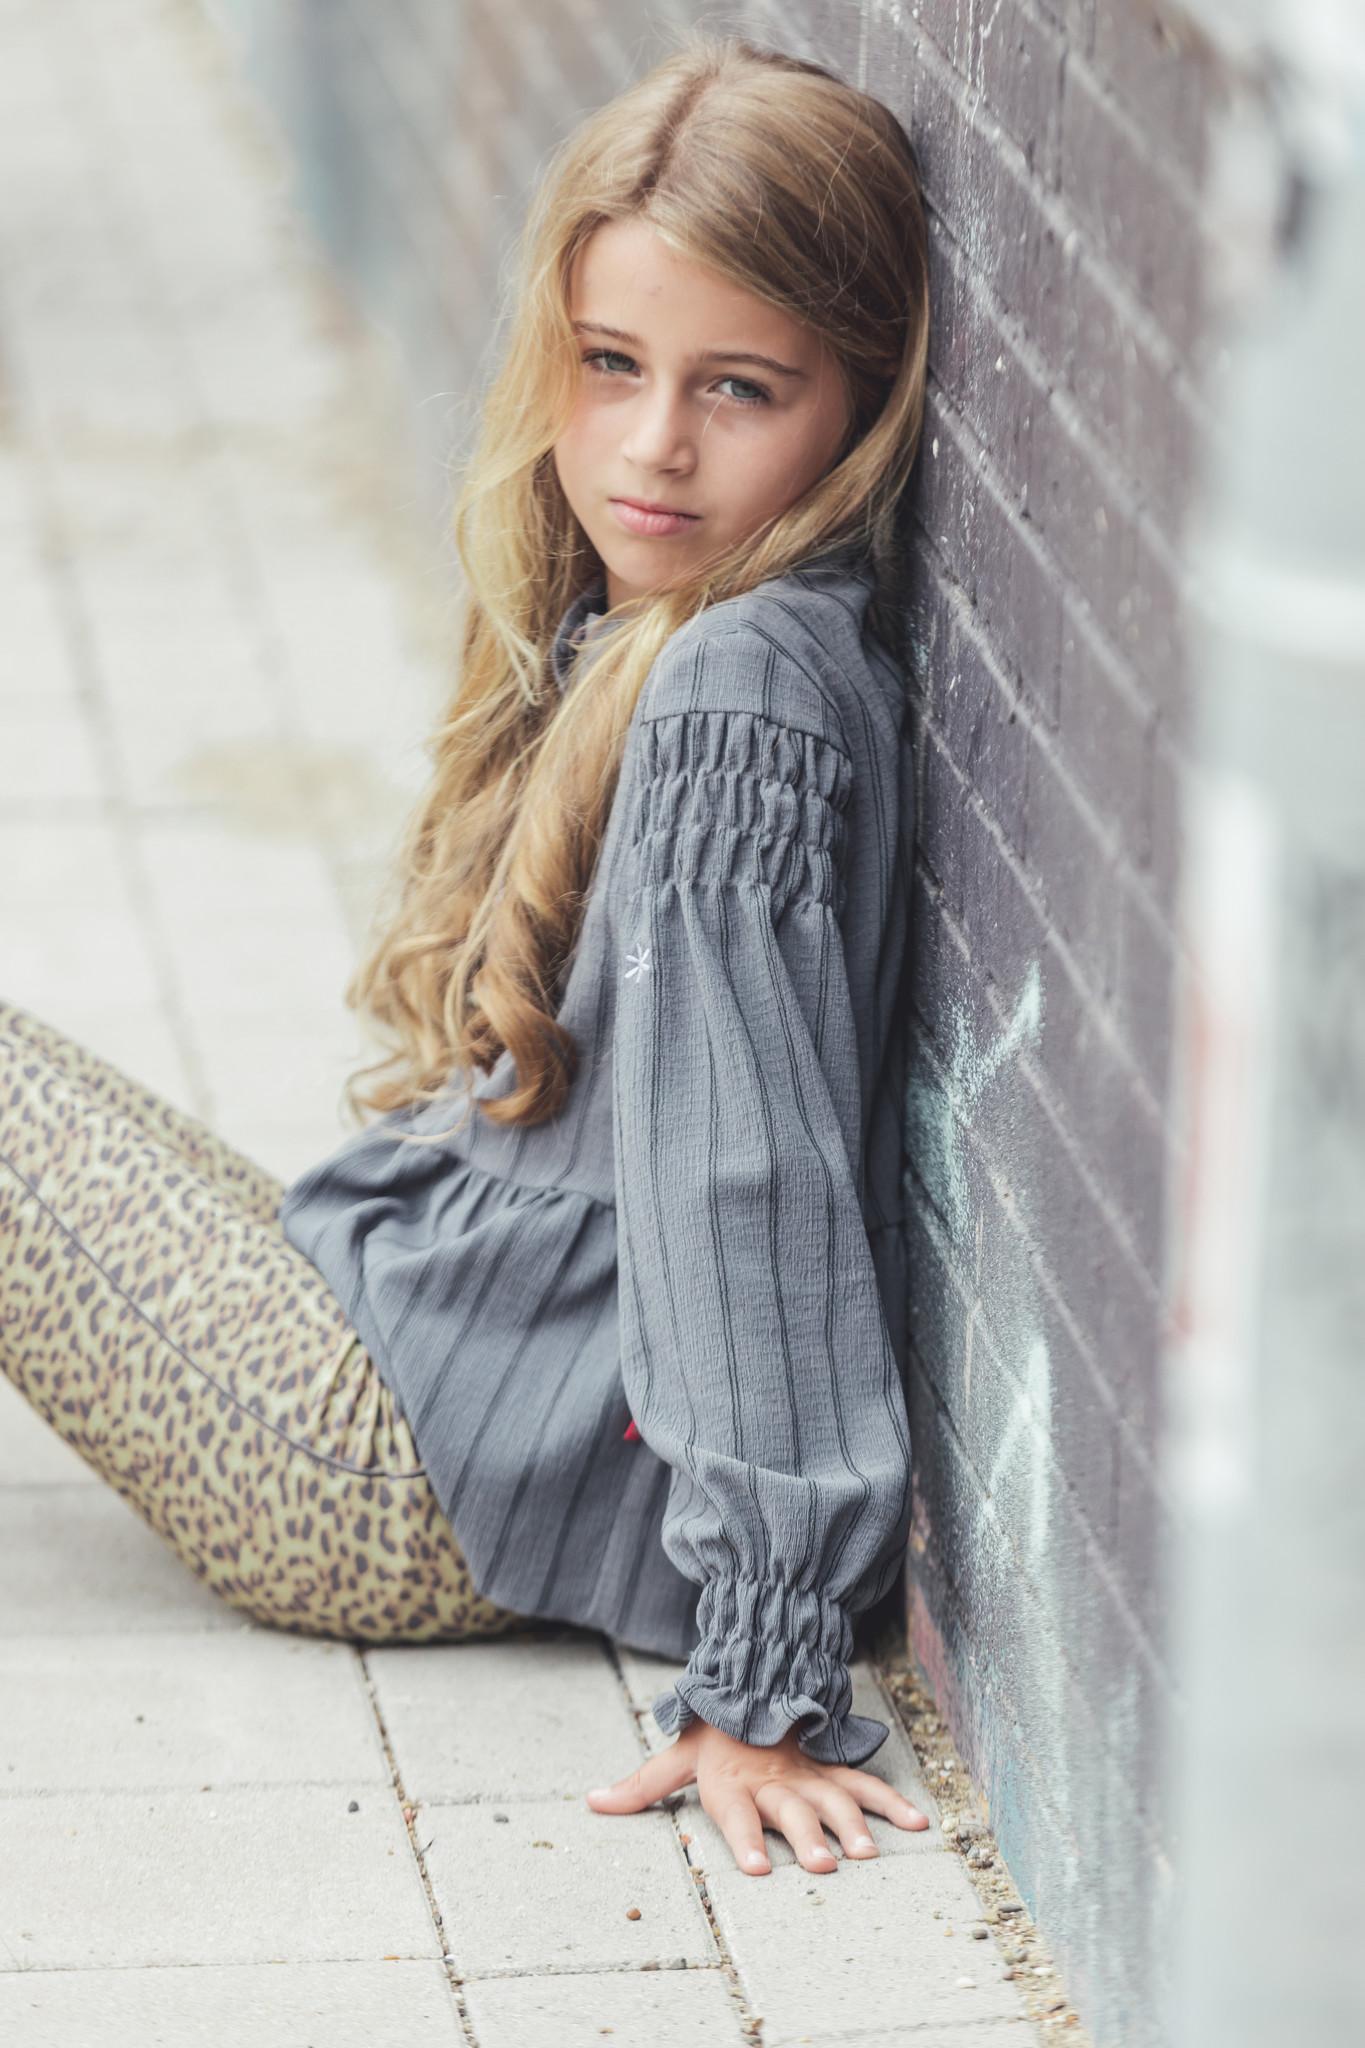 Mayce Girlslabel lookbook winter 2022-23